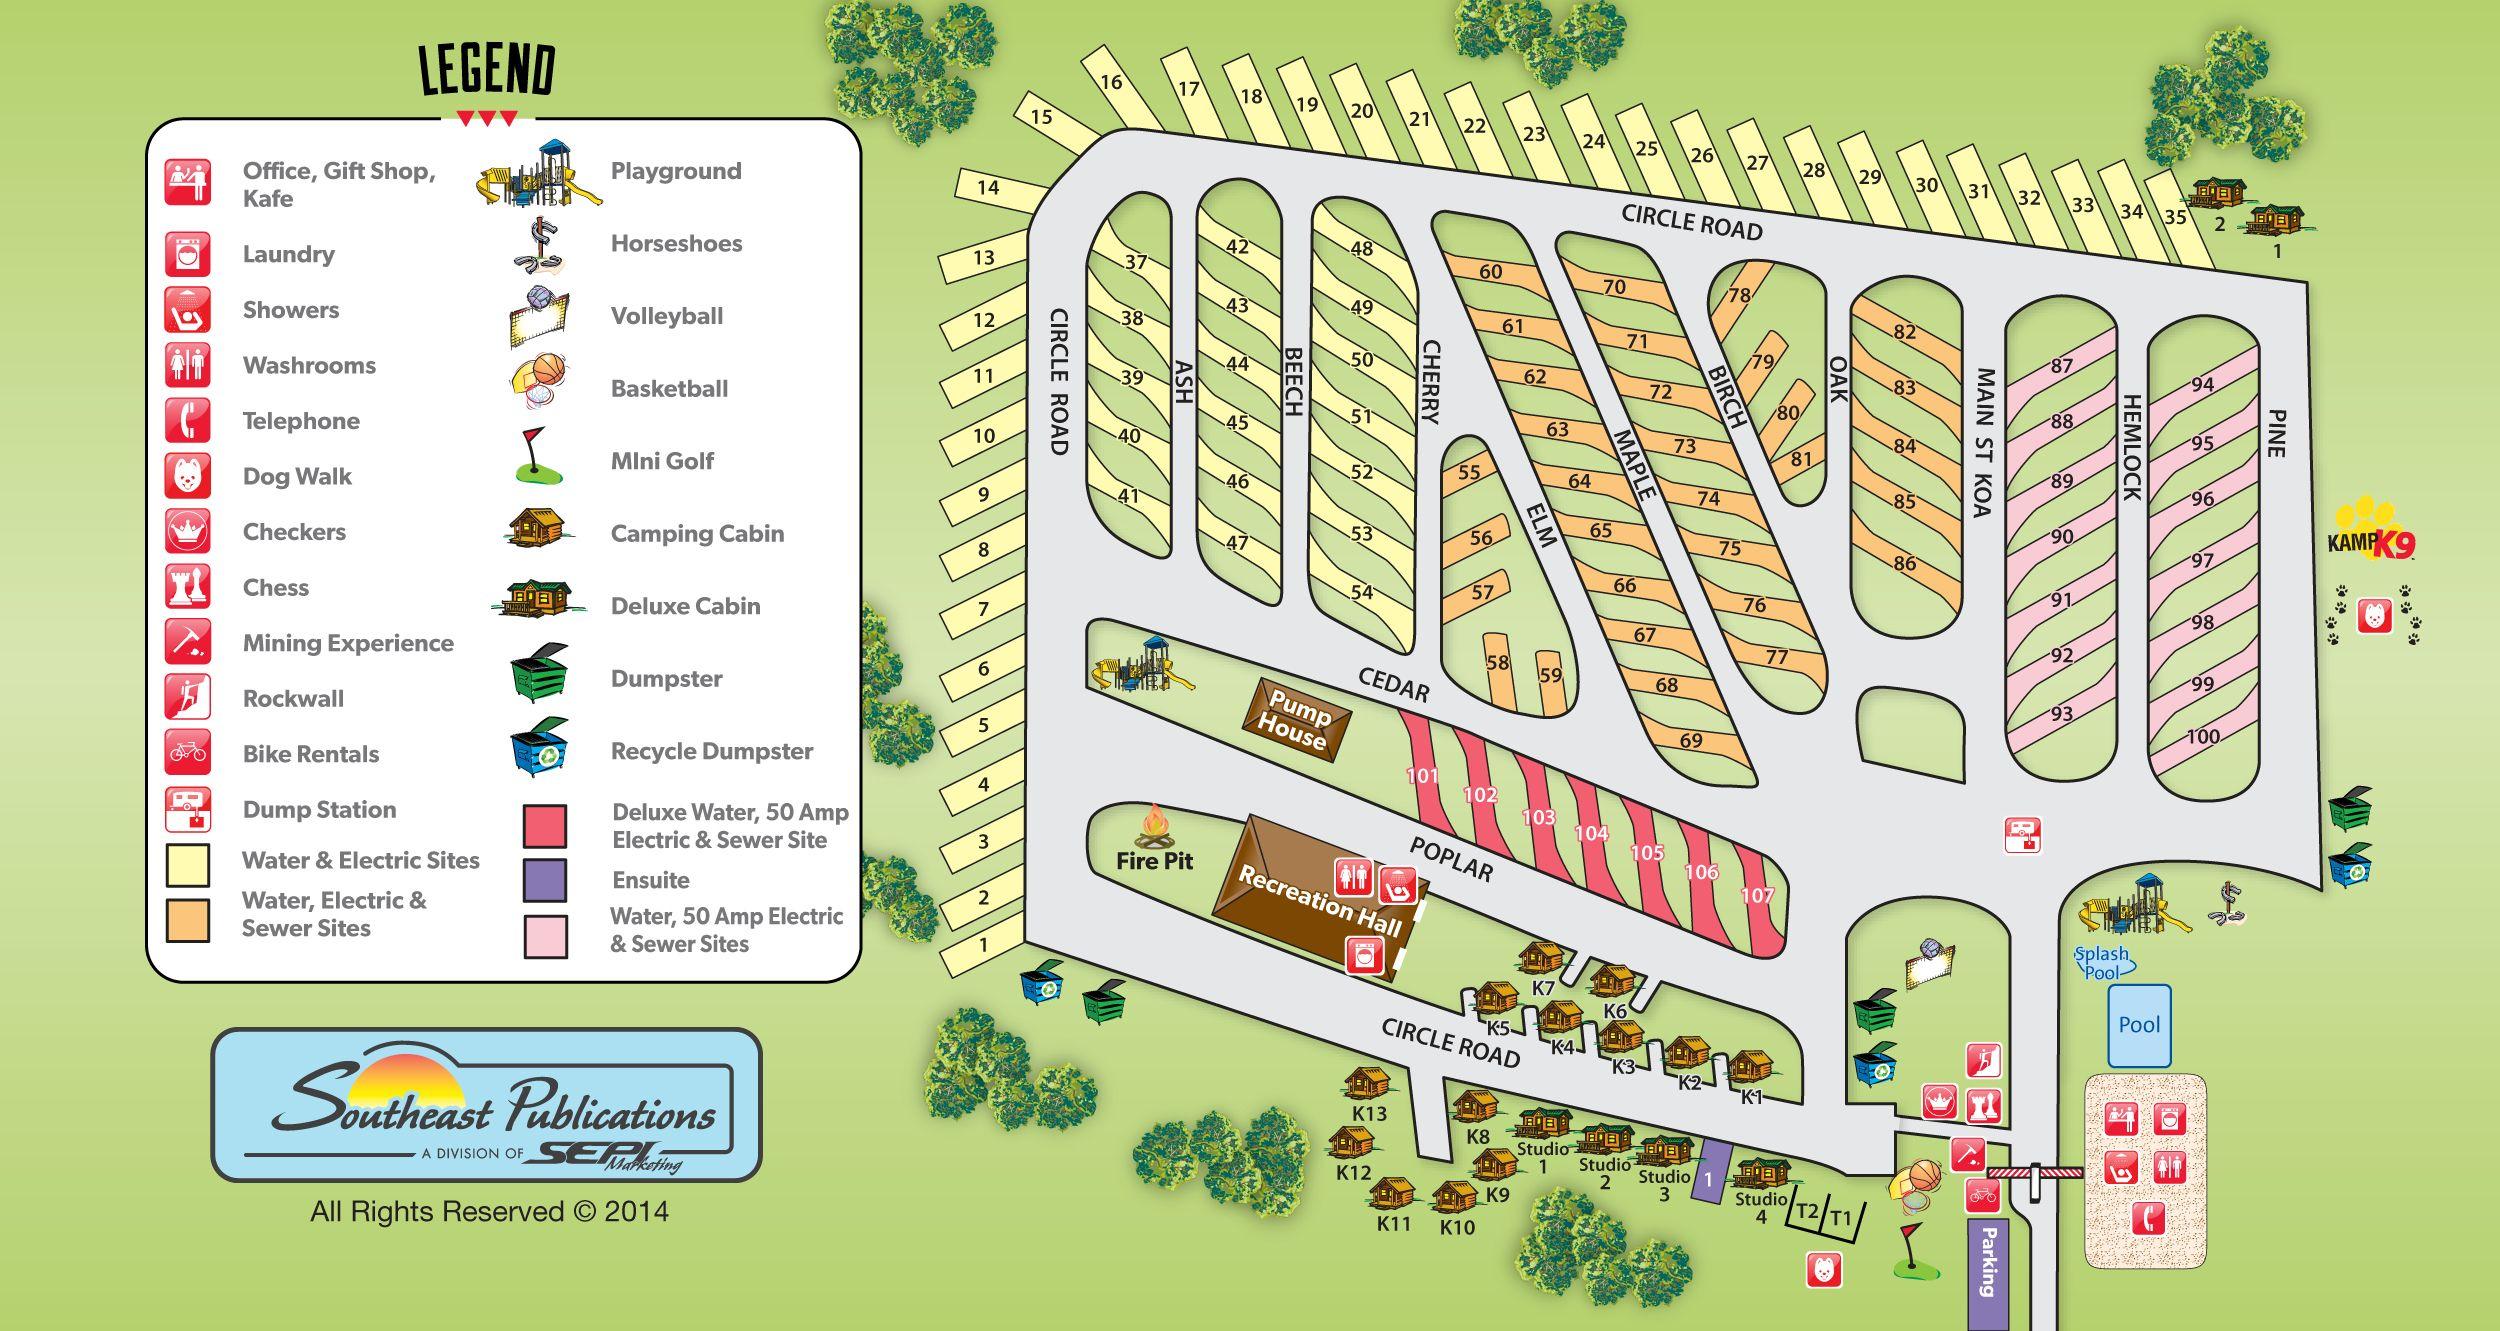 Map Of Koa Arizona.Toronto North Cookstown Koa Campground Site Map Camping